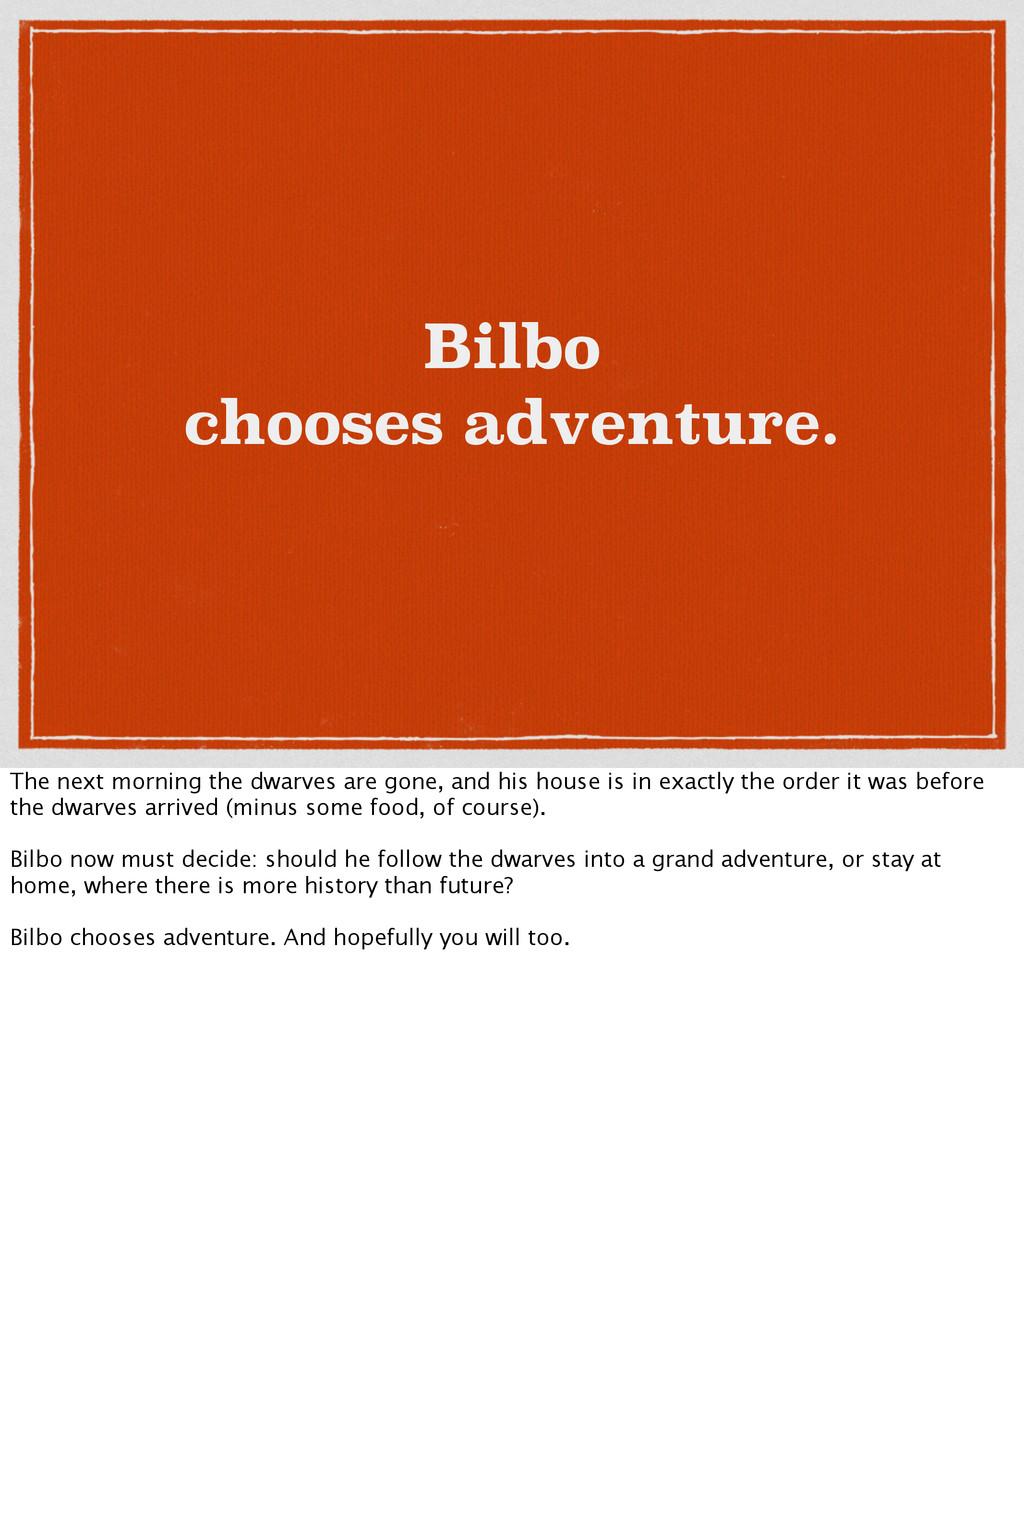 Bilbo chooses adventure. The next morning the d...